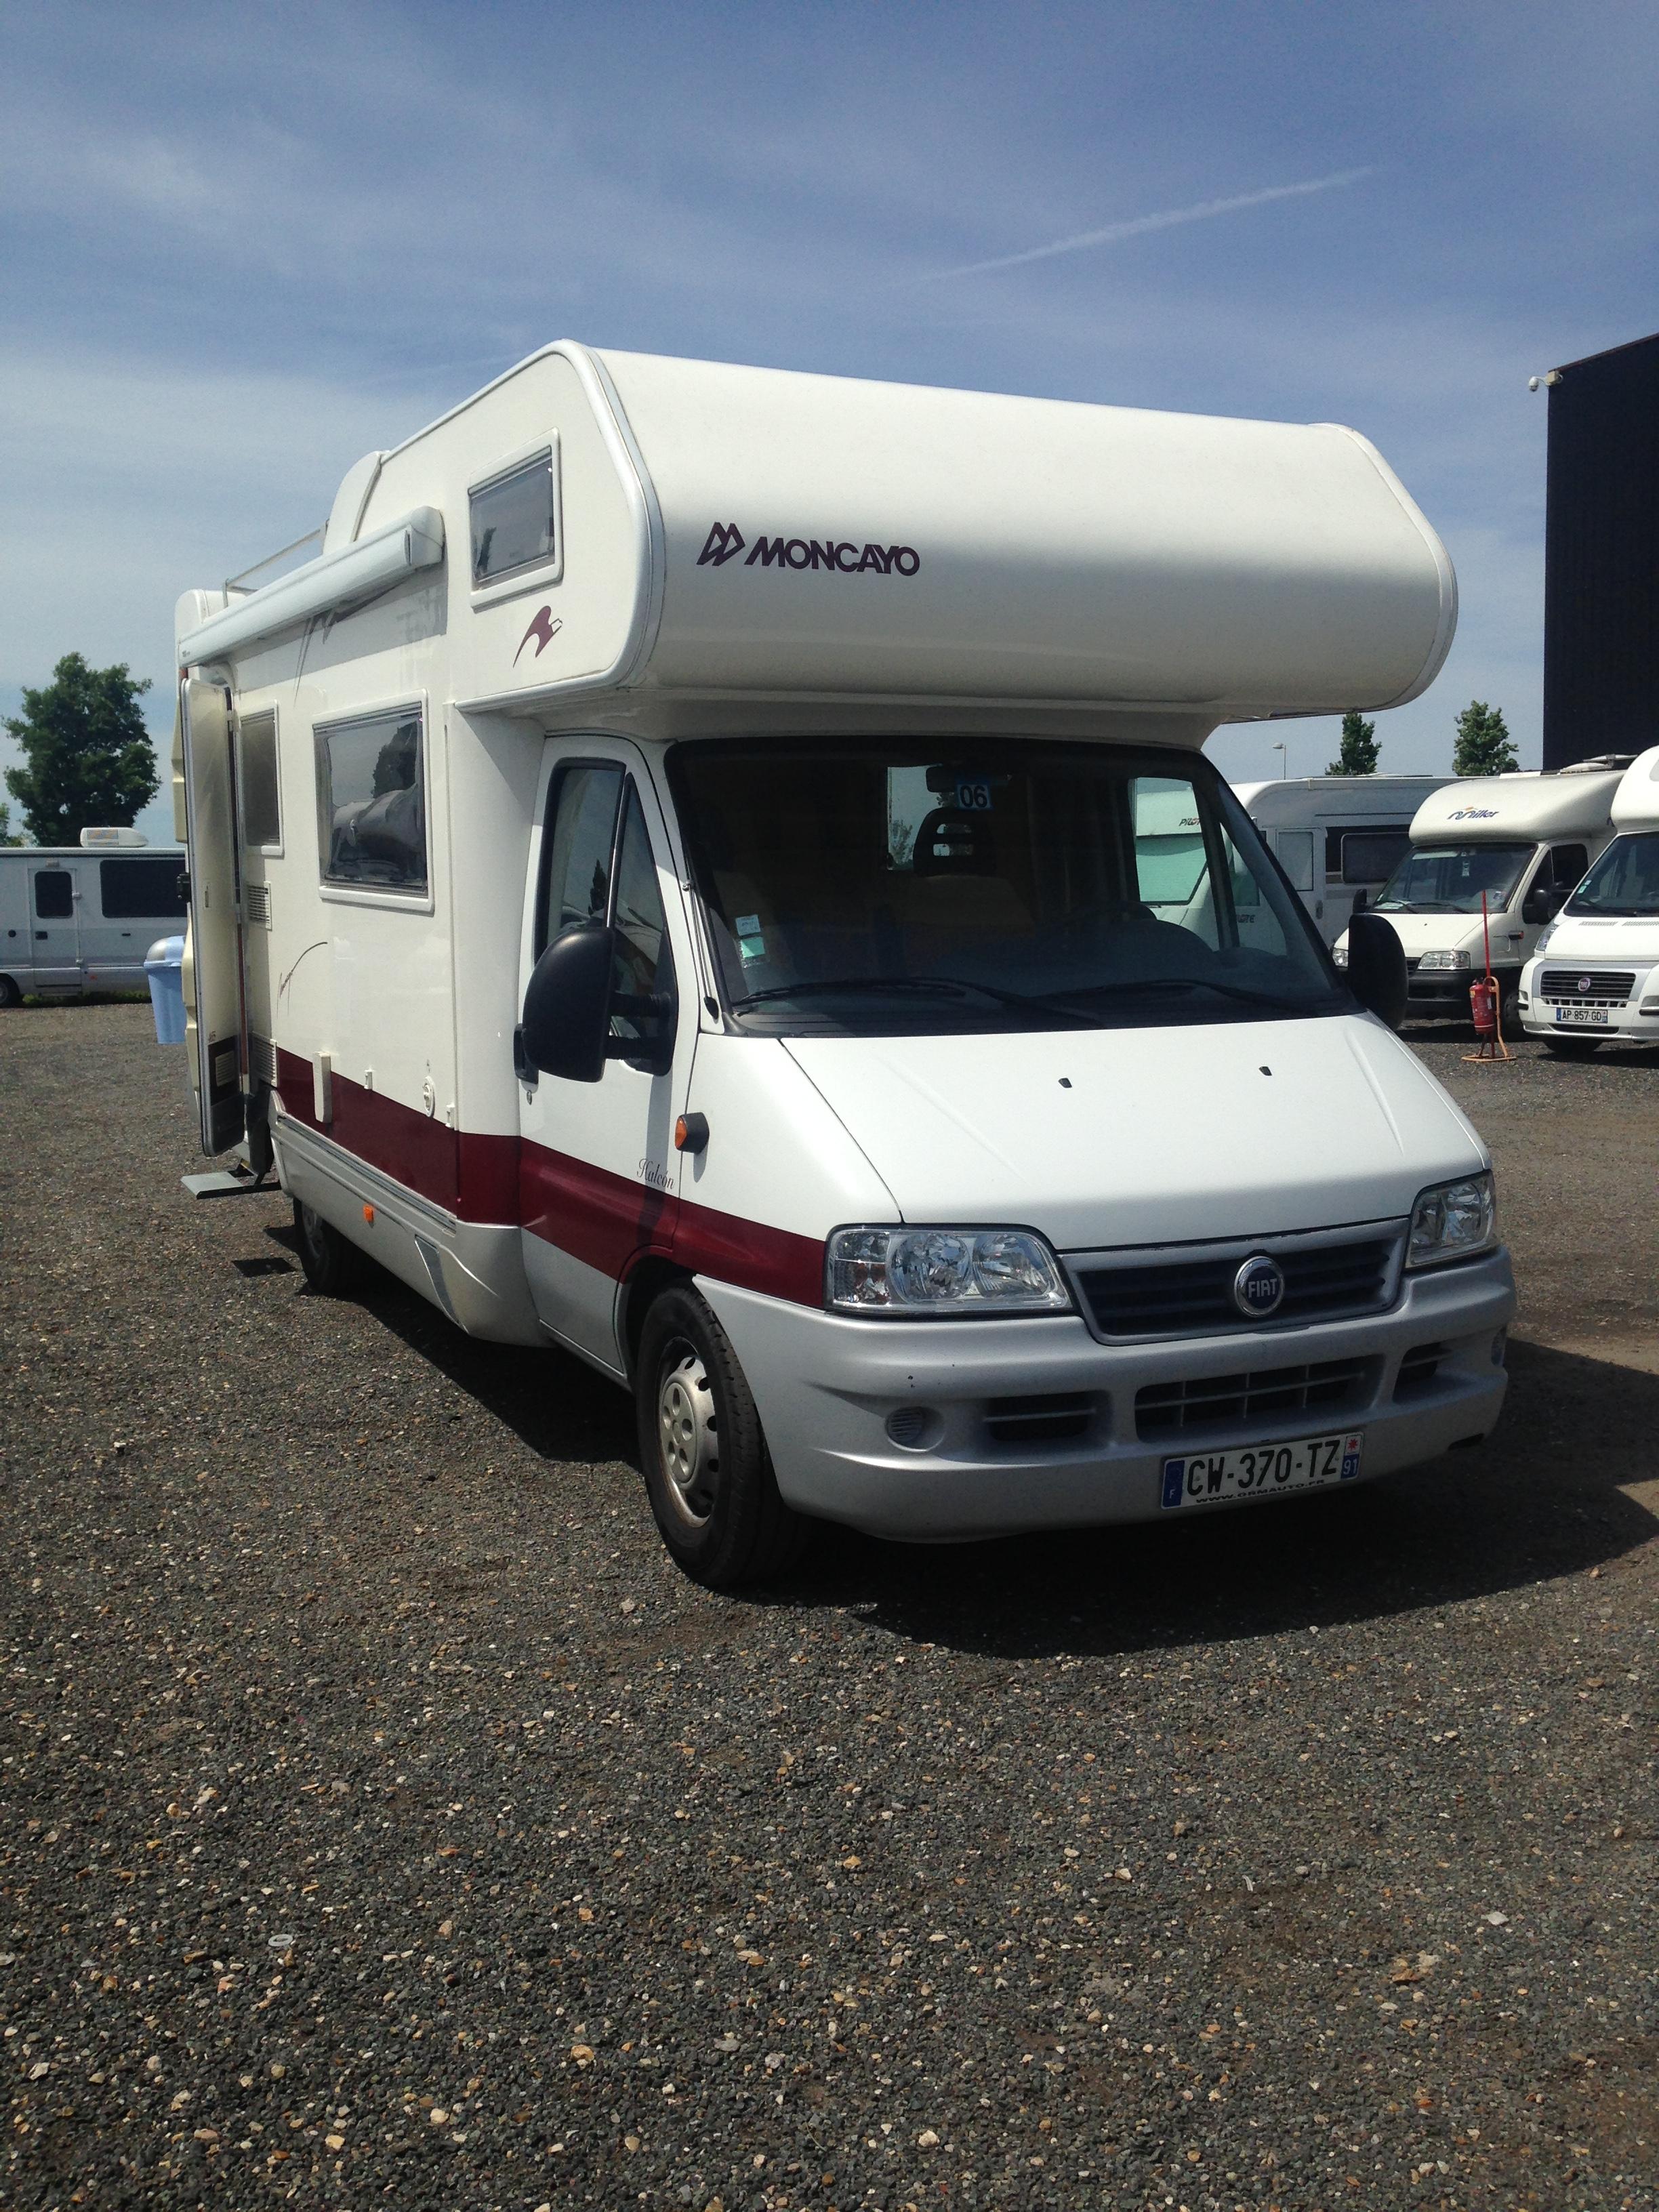 Camping Car Fiat Moncayo L